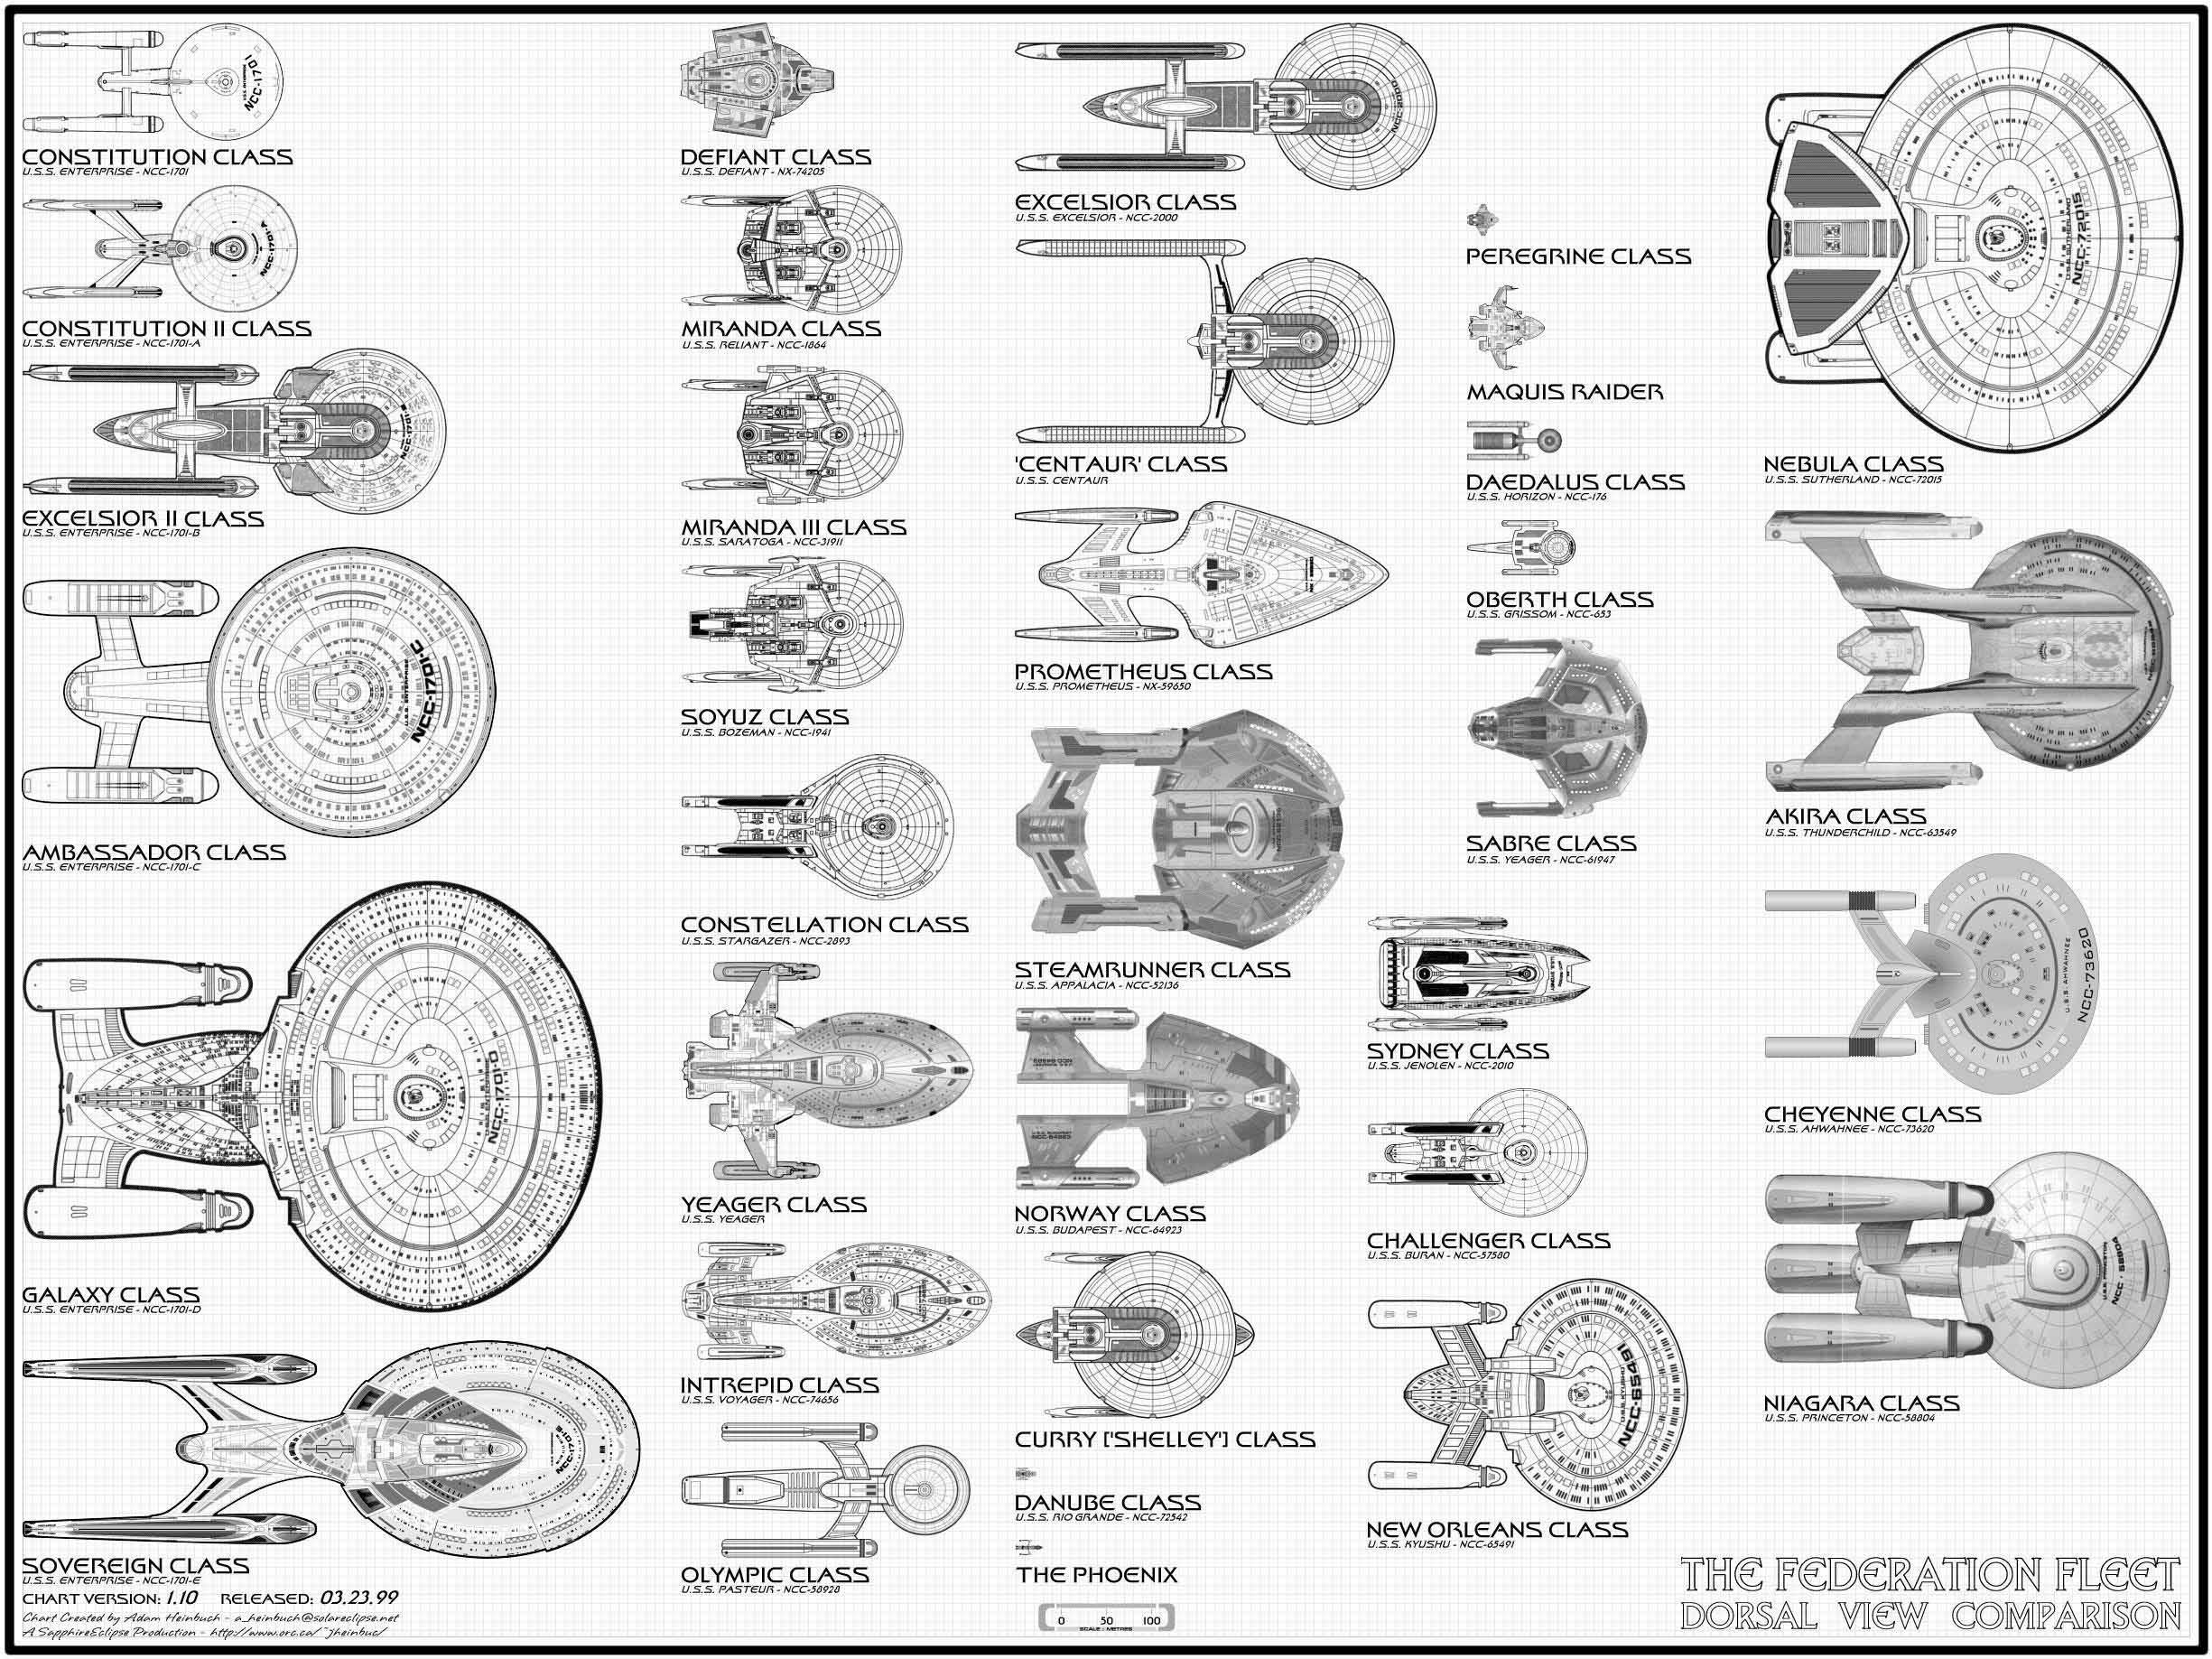 Star Trek: Federation Fleet Starships Size Comparison